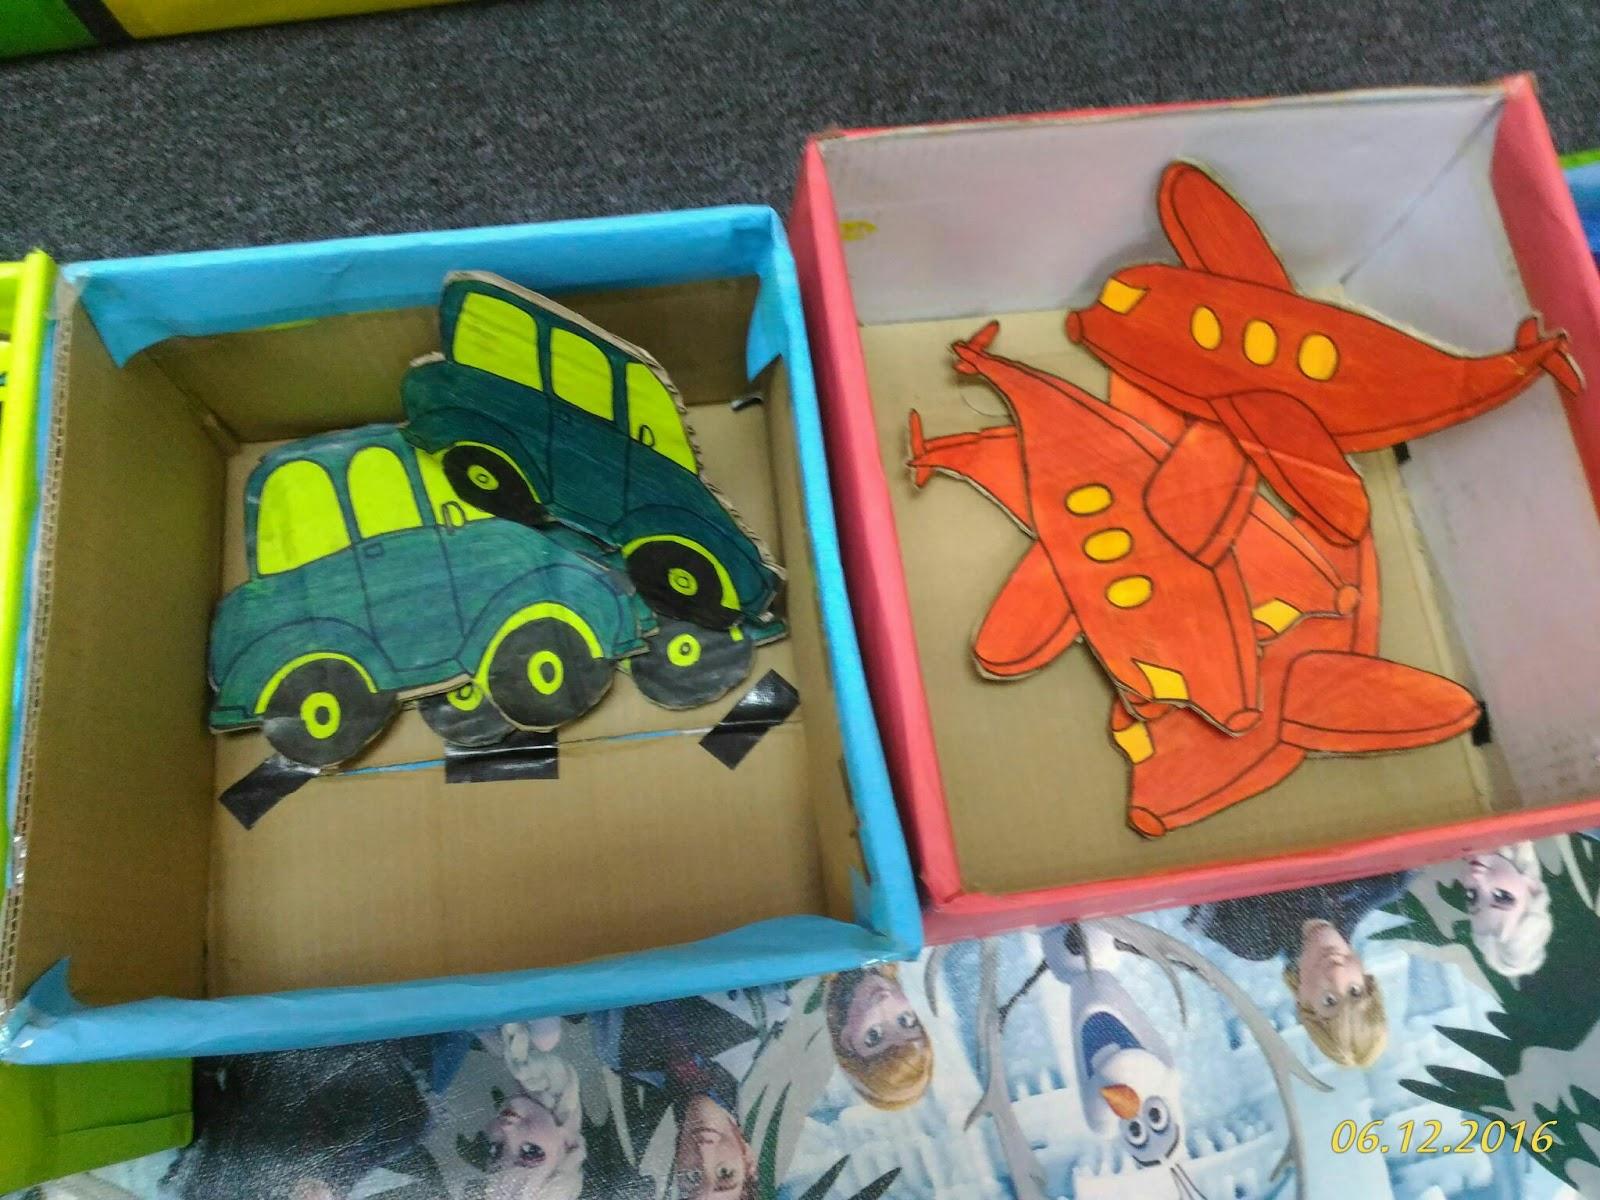 Buat Mainan Begini Menggunakan Kotak Tak Perlu Dibeli